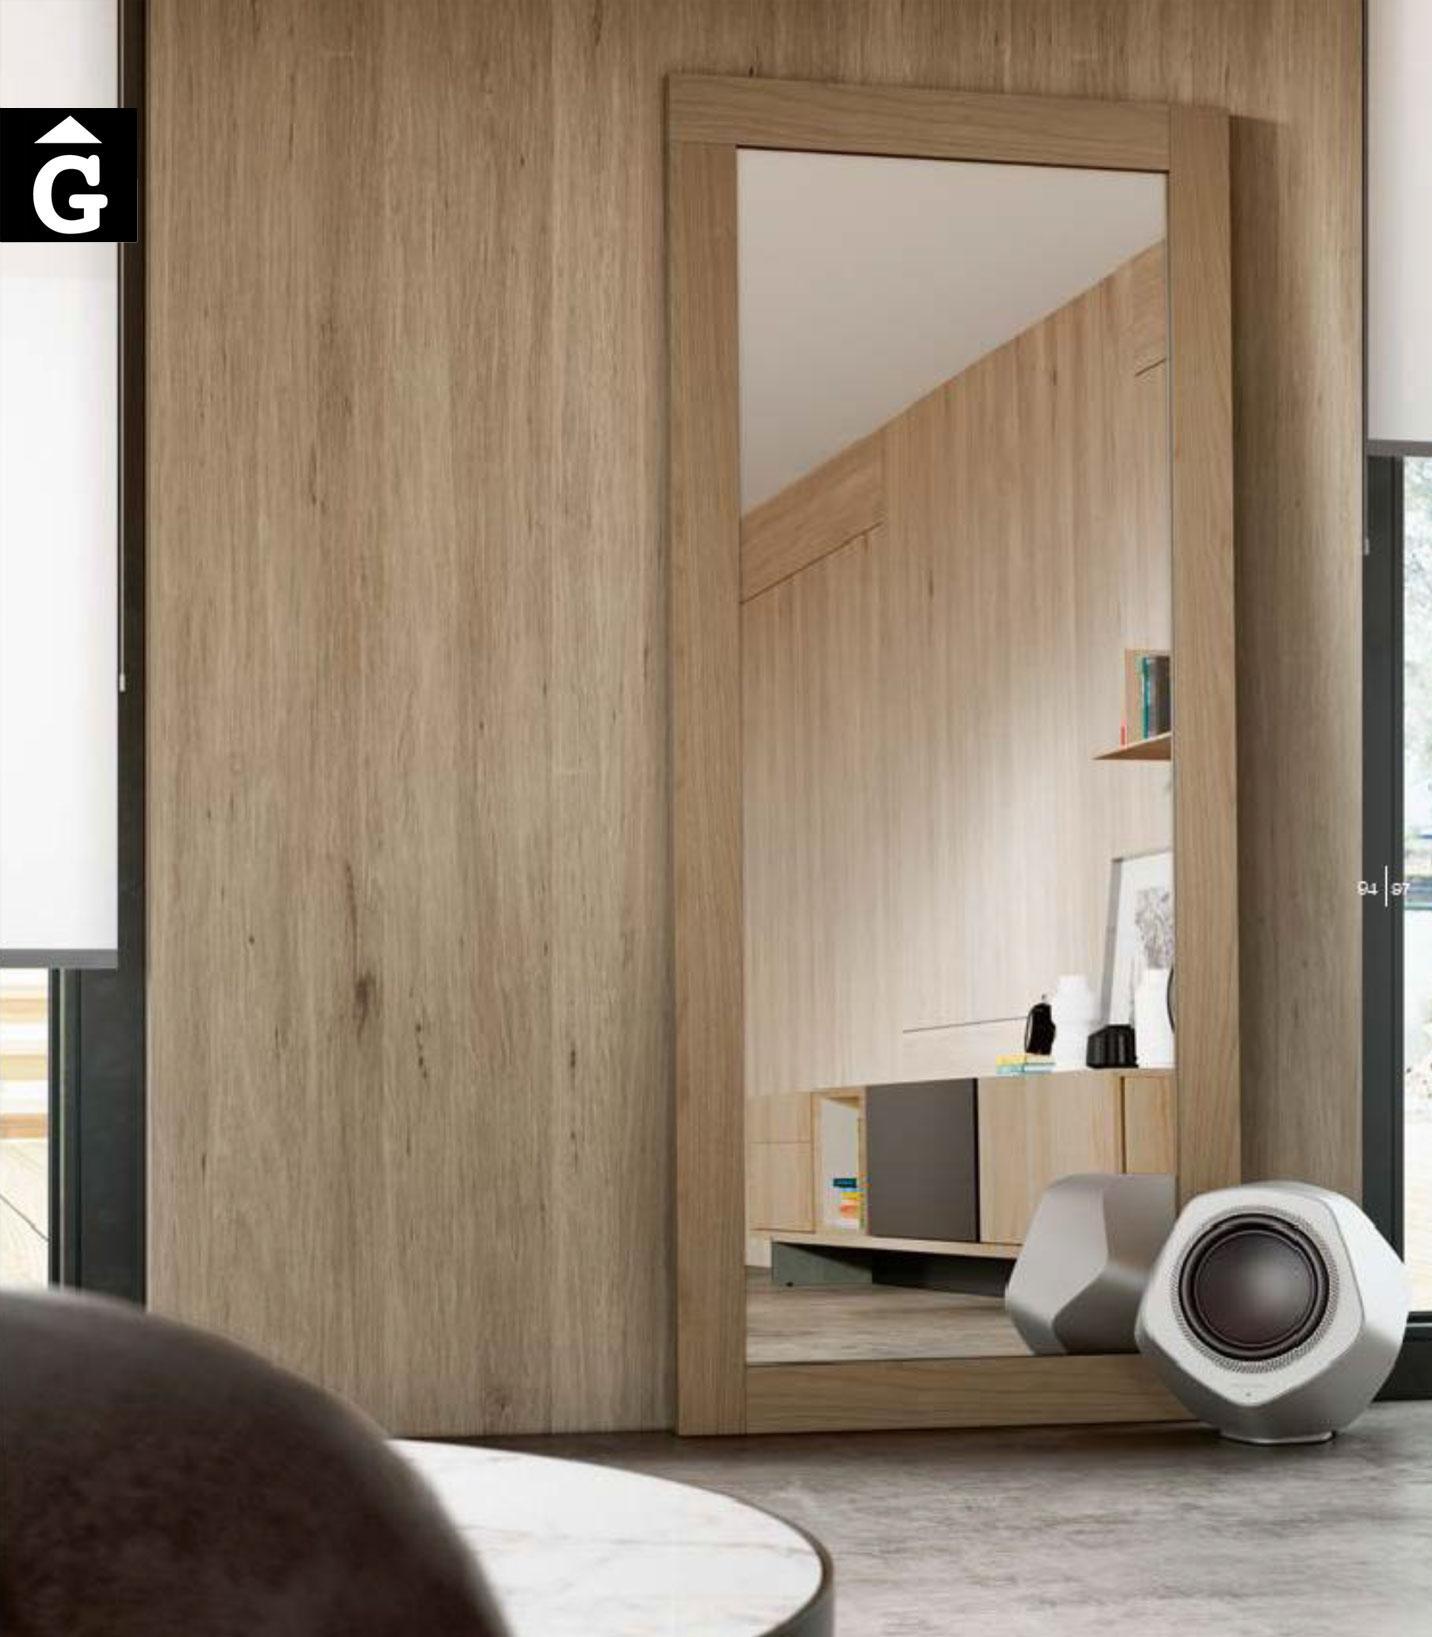 MOBLE-50-V-CONNECTOR-EMEDE-mobles-by-Mobles-GIFREU-Girona-ESPAI-EMEDE-Epacio-emede-Muebles-MD-moble-menjador-Sala-estar-habitatge-qualitat-laca-xapa-natural